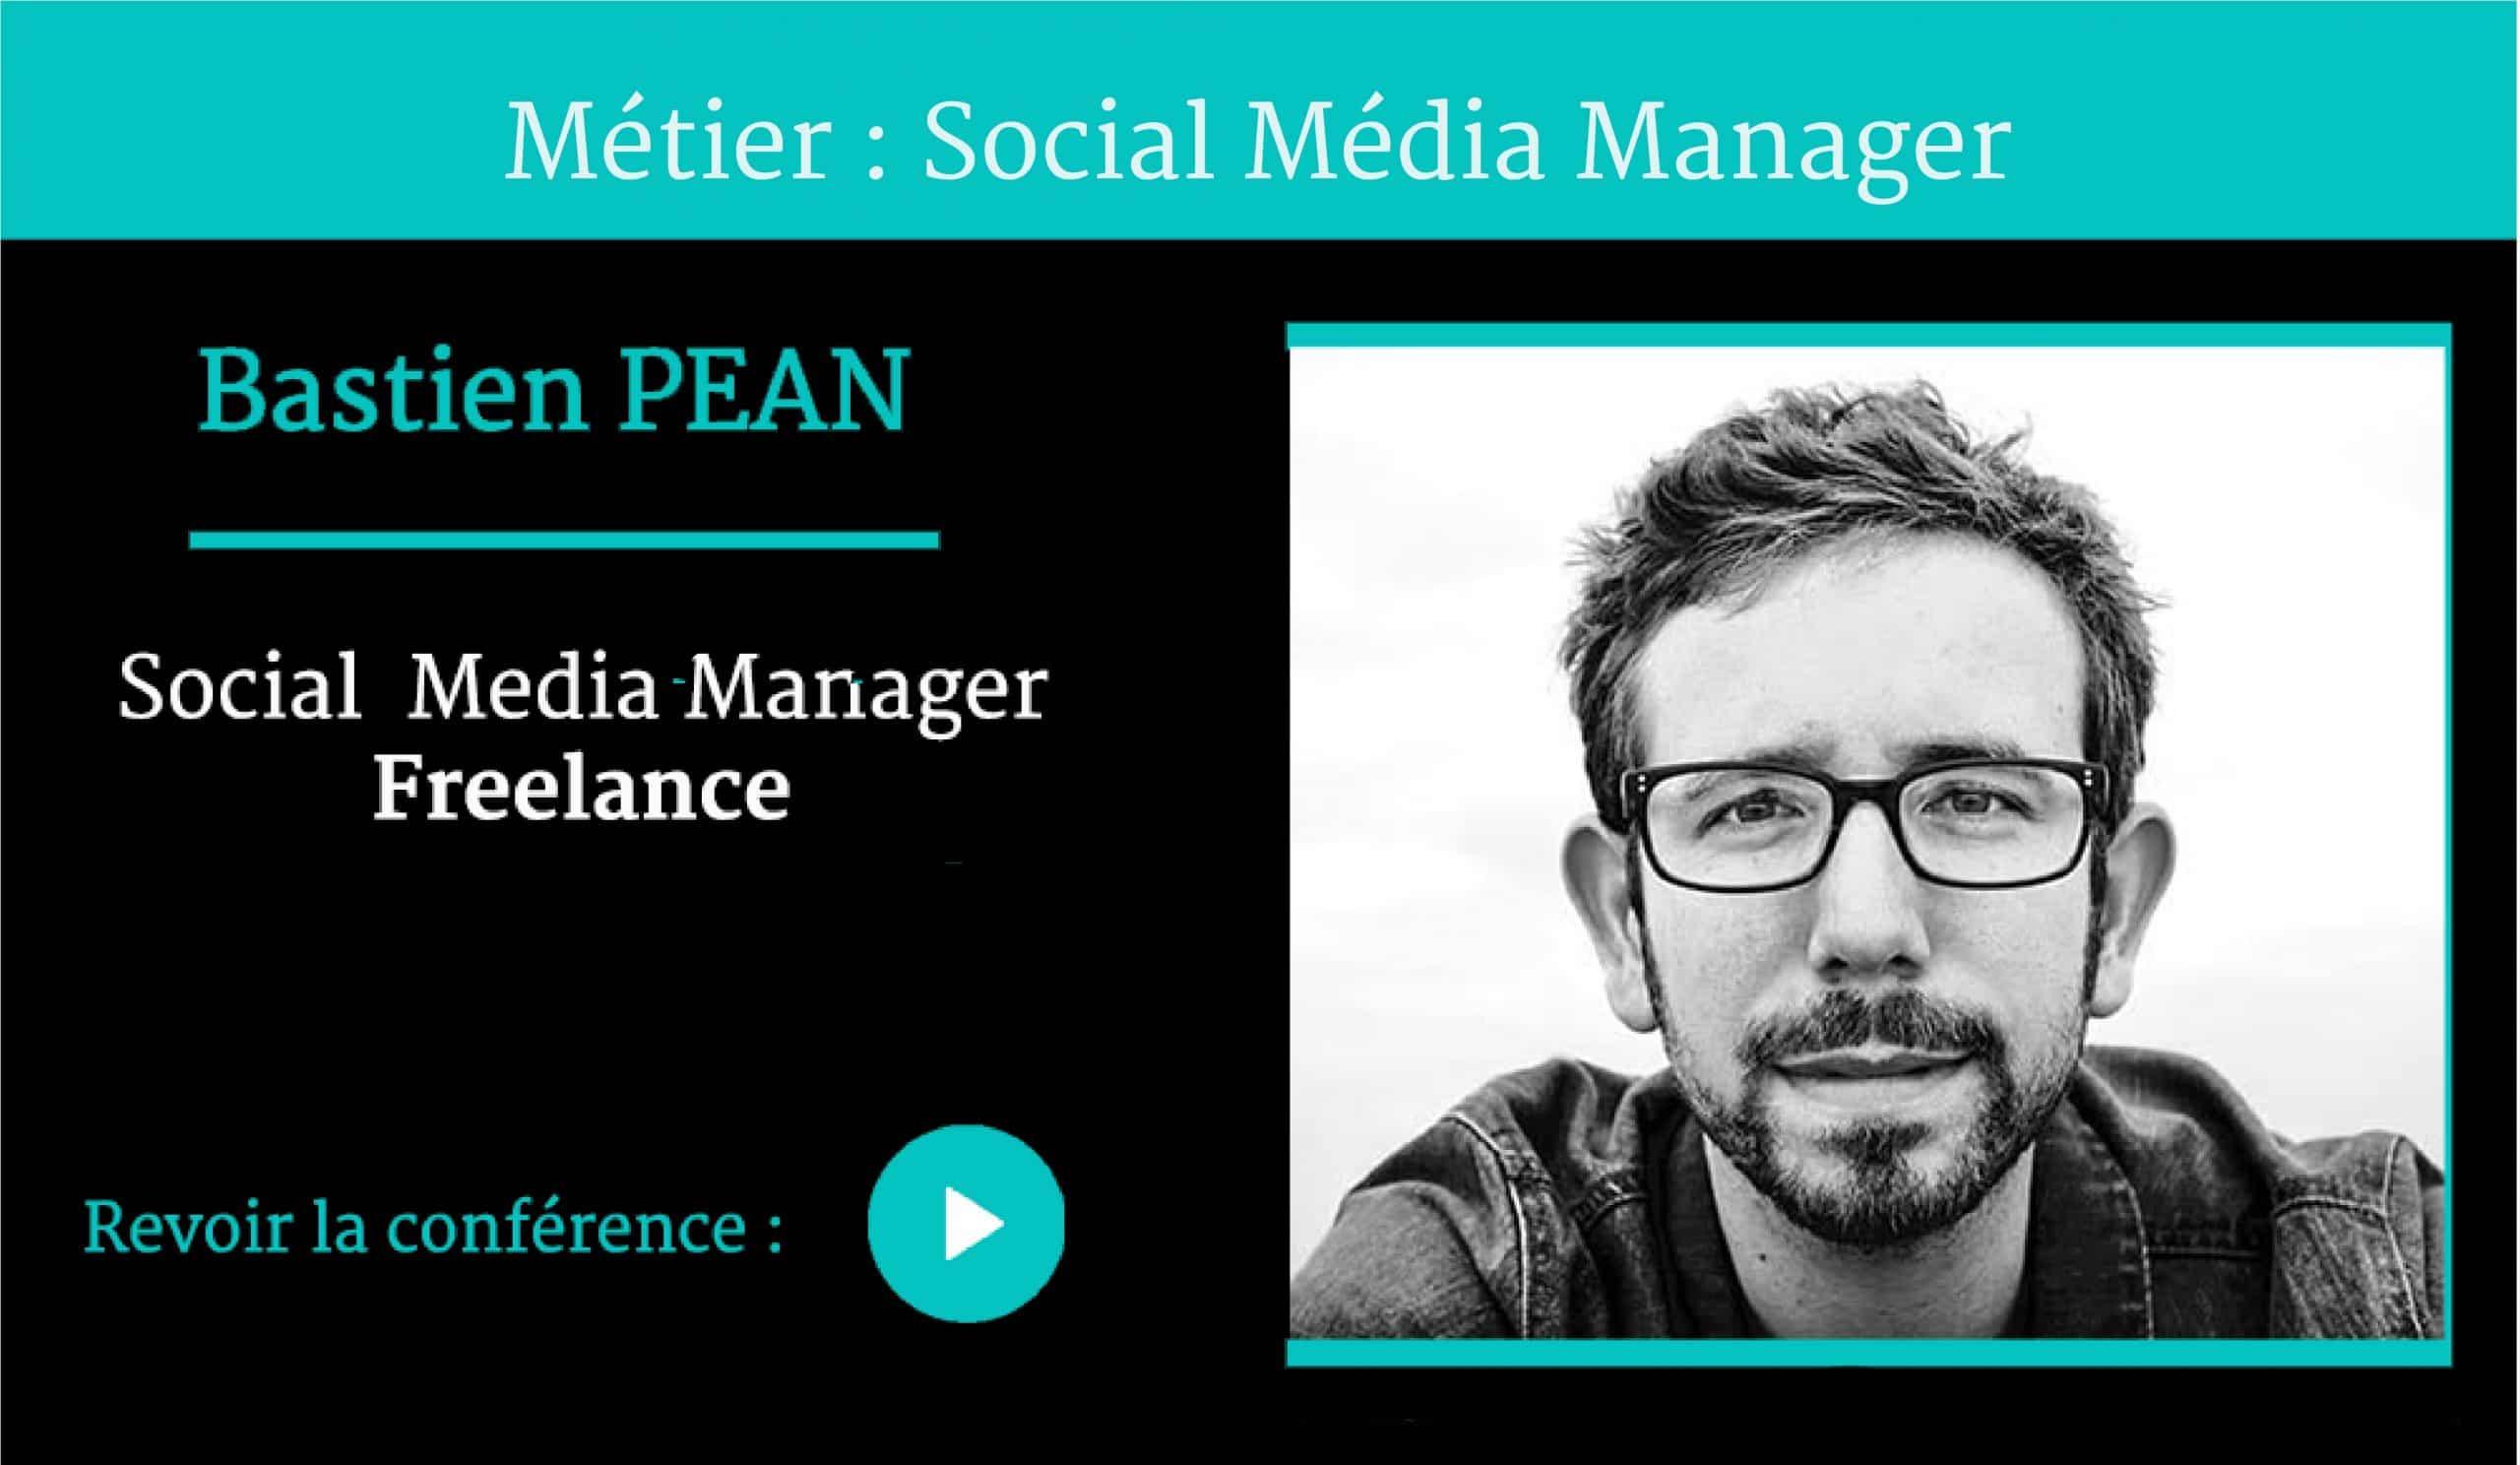 Métier Social Media Manager conférence Bastien Péan pour Naïas – National Institute of Advertising Strategy